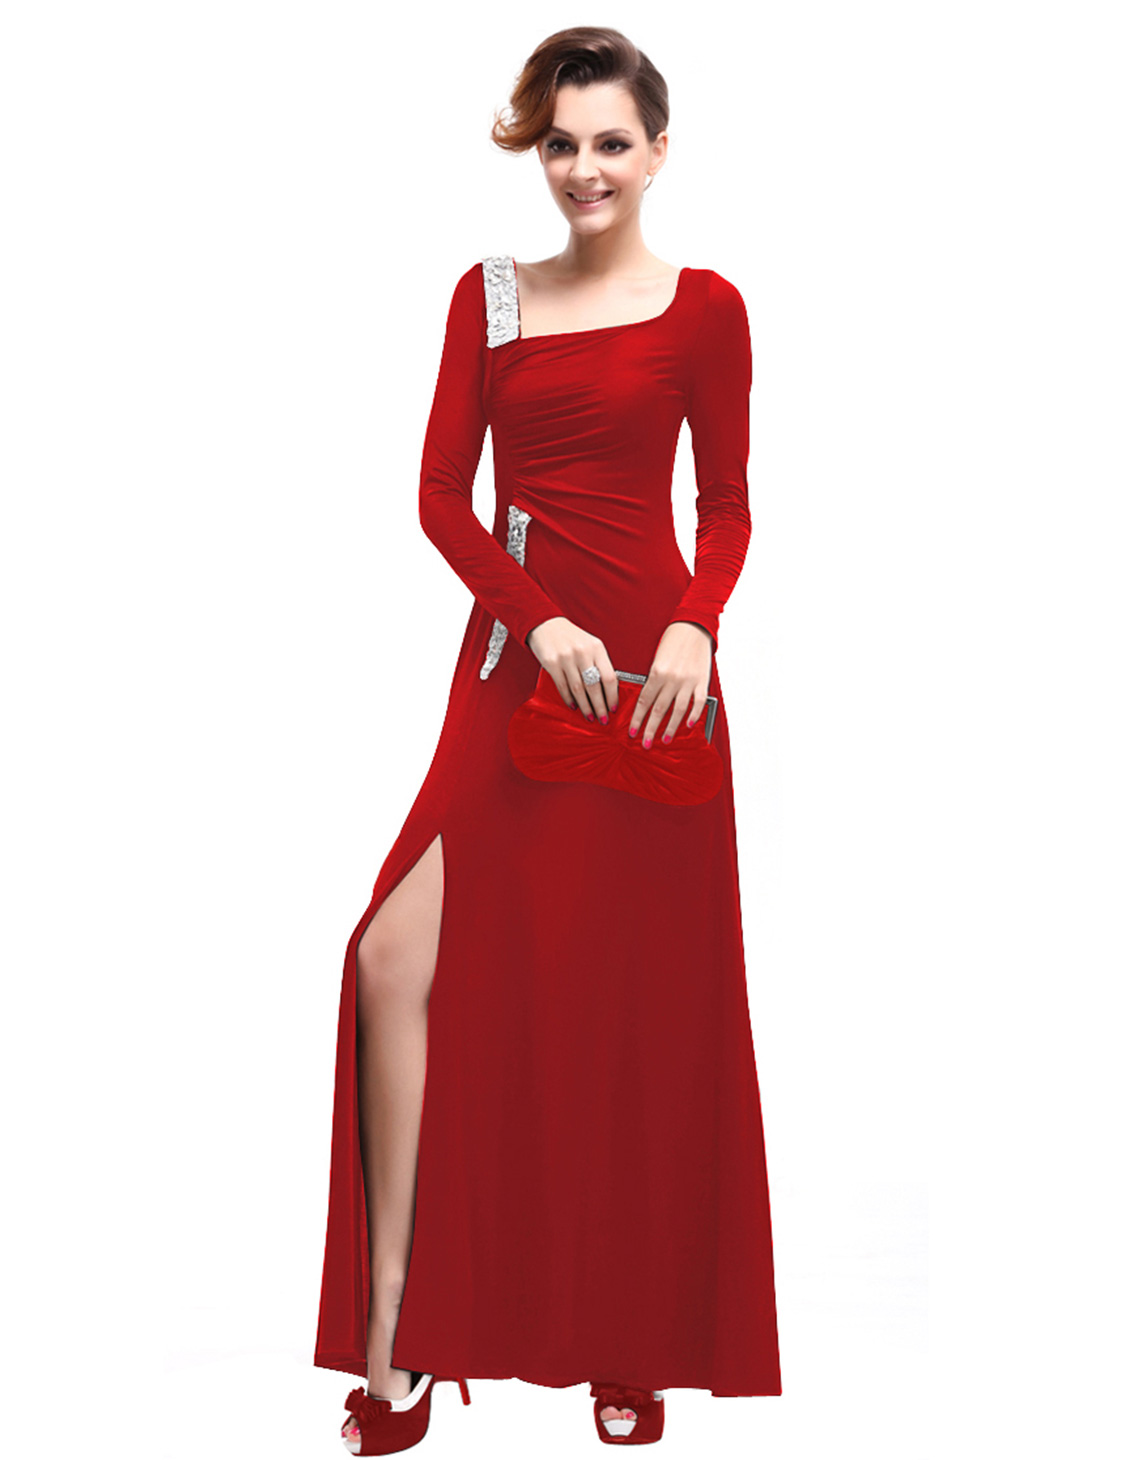 Long Sleeve Evening Dresses Ebay - Plus Size Tops